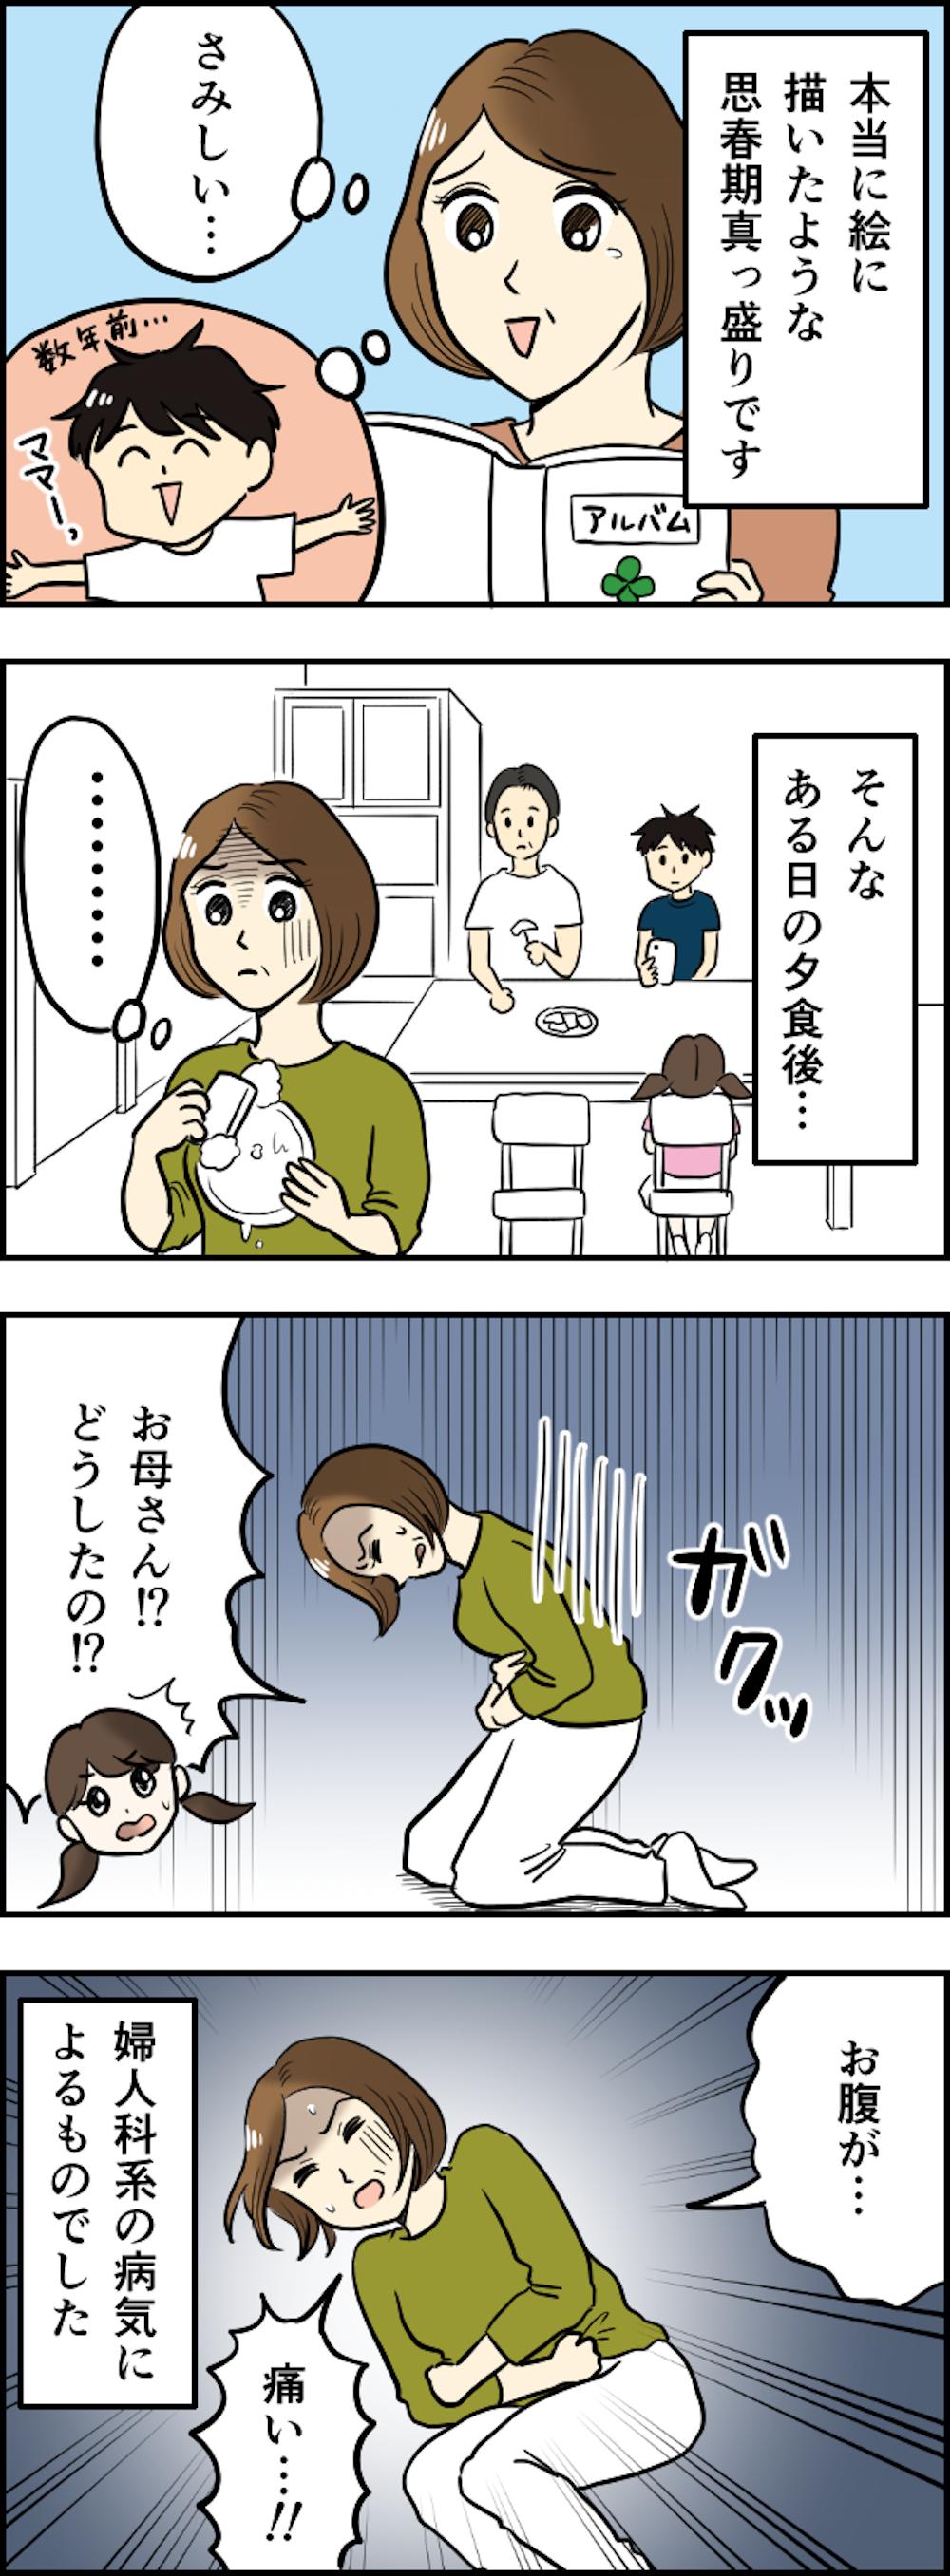 31kansei_02.png